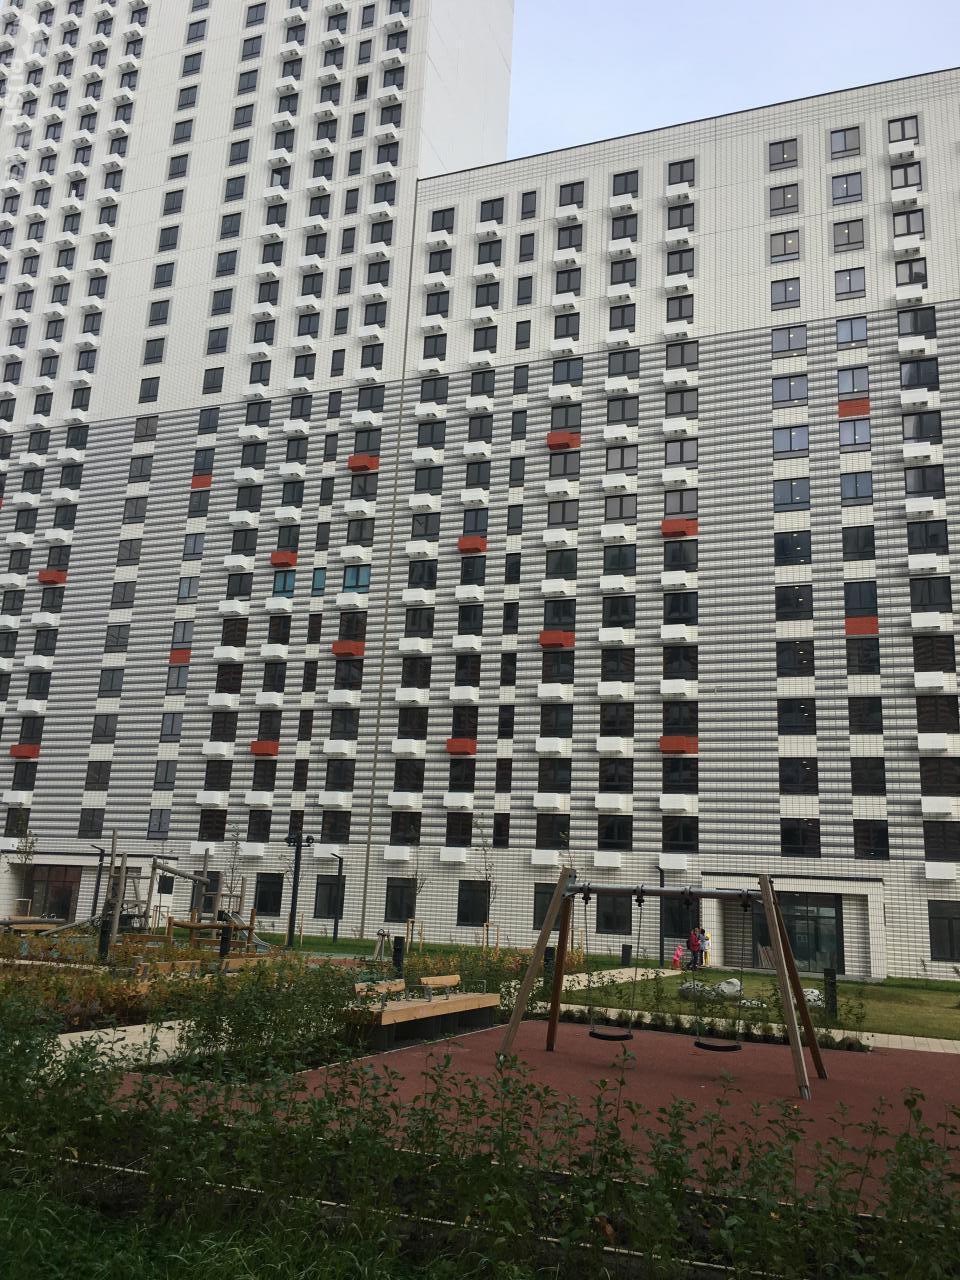 Продаётся 1-комнатная квартира 34.4 кв.м. этаж 5/15 за 5 600 000 руб